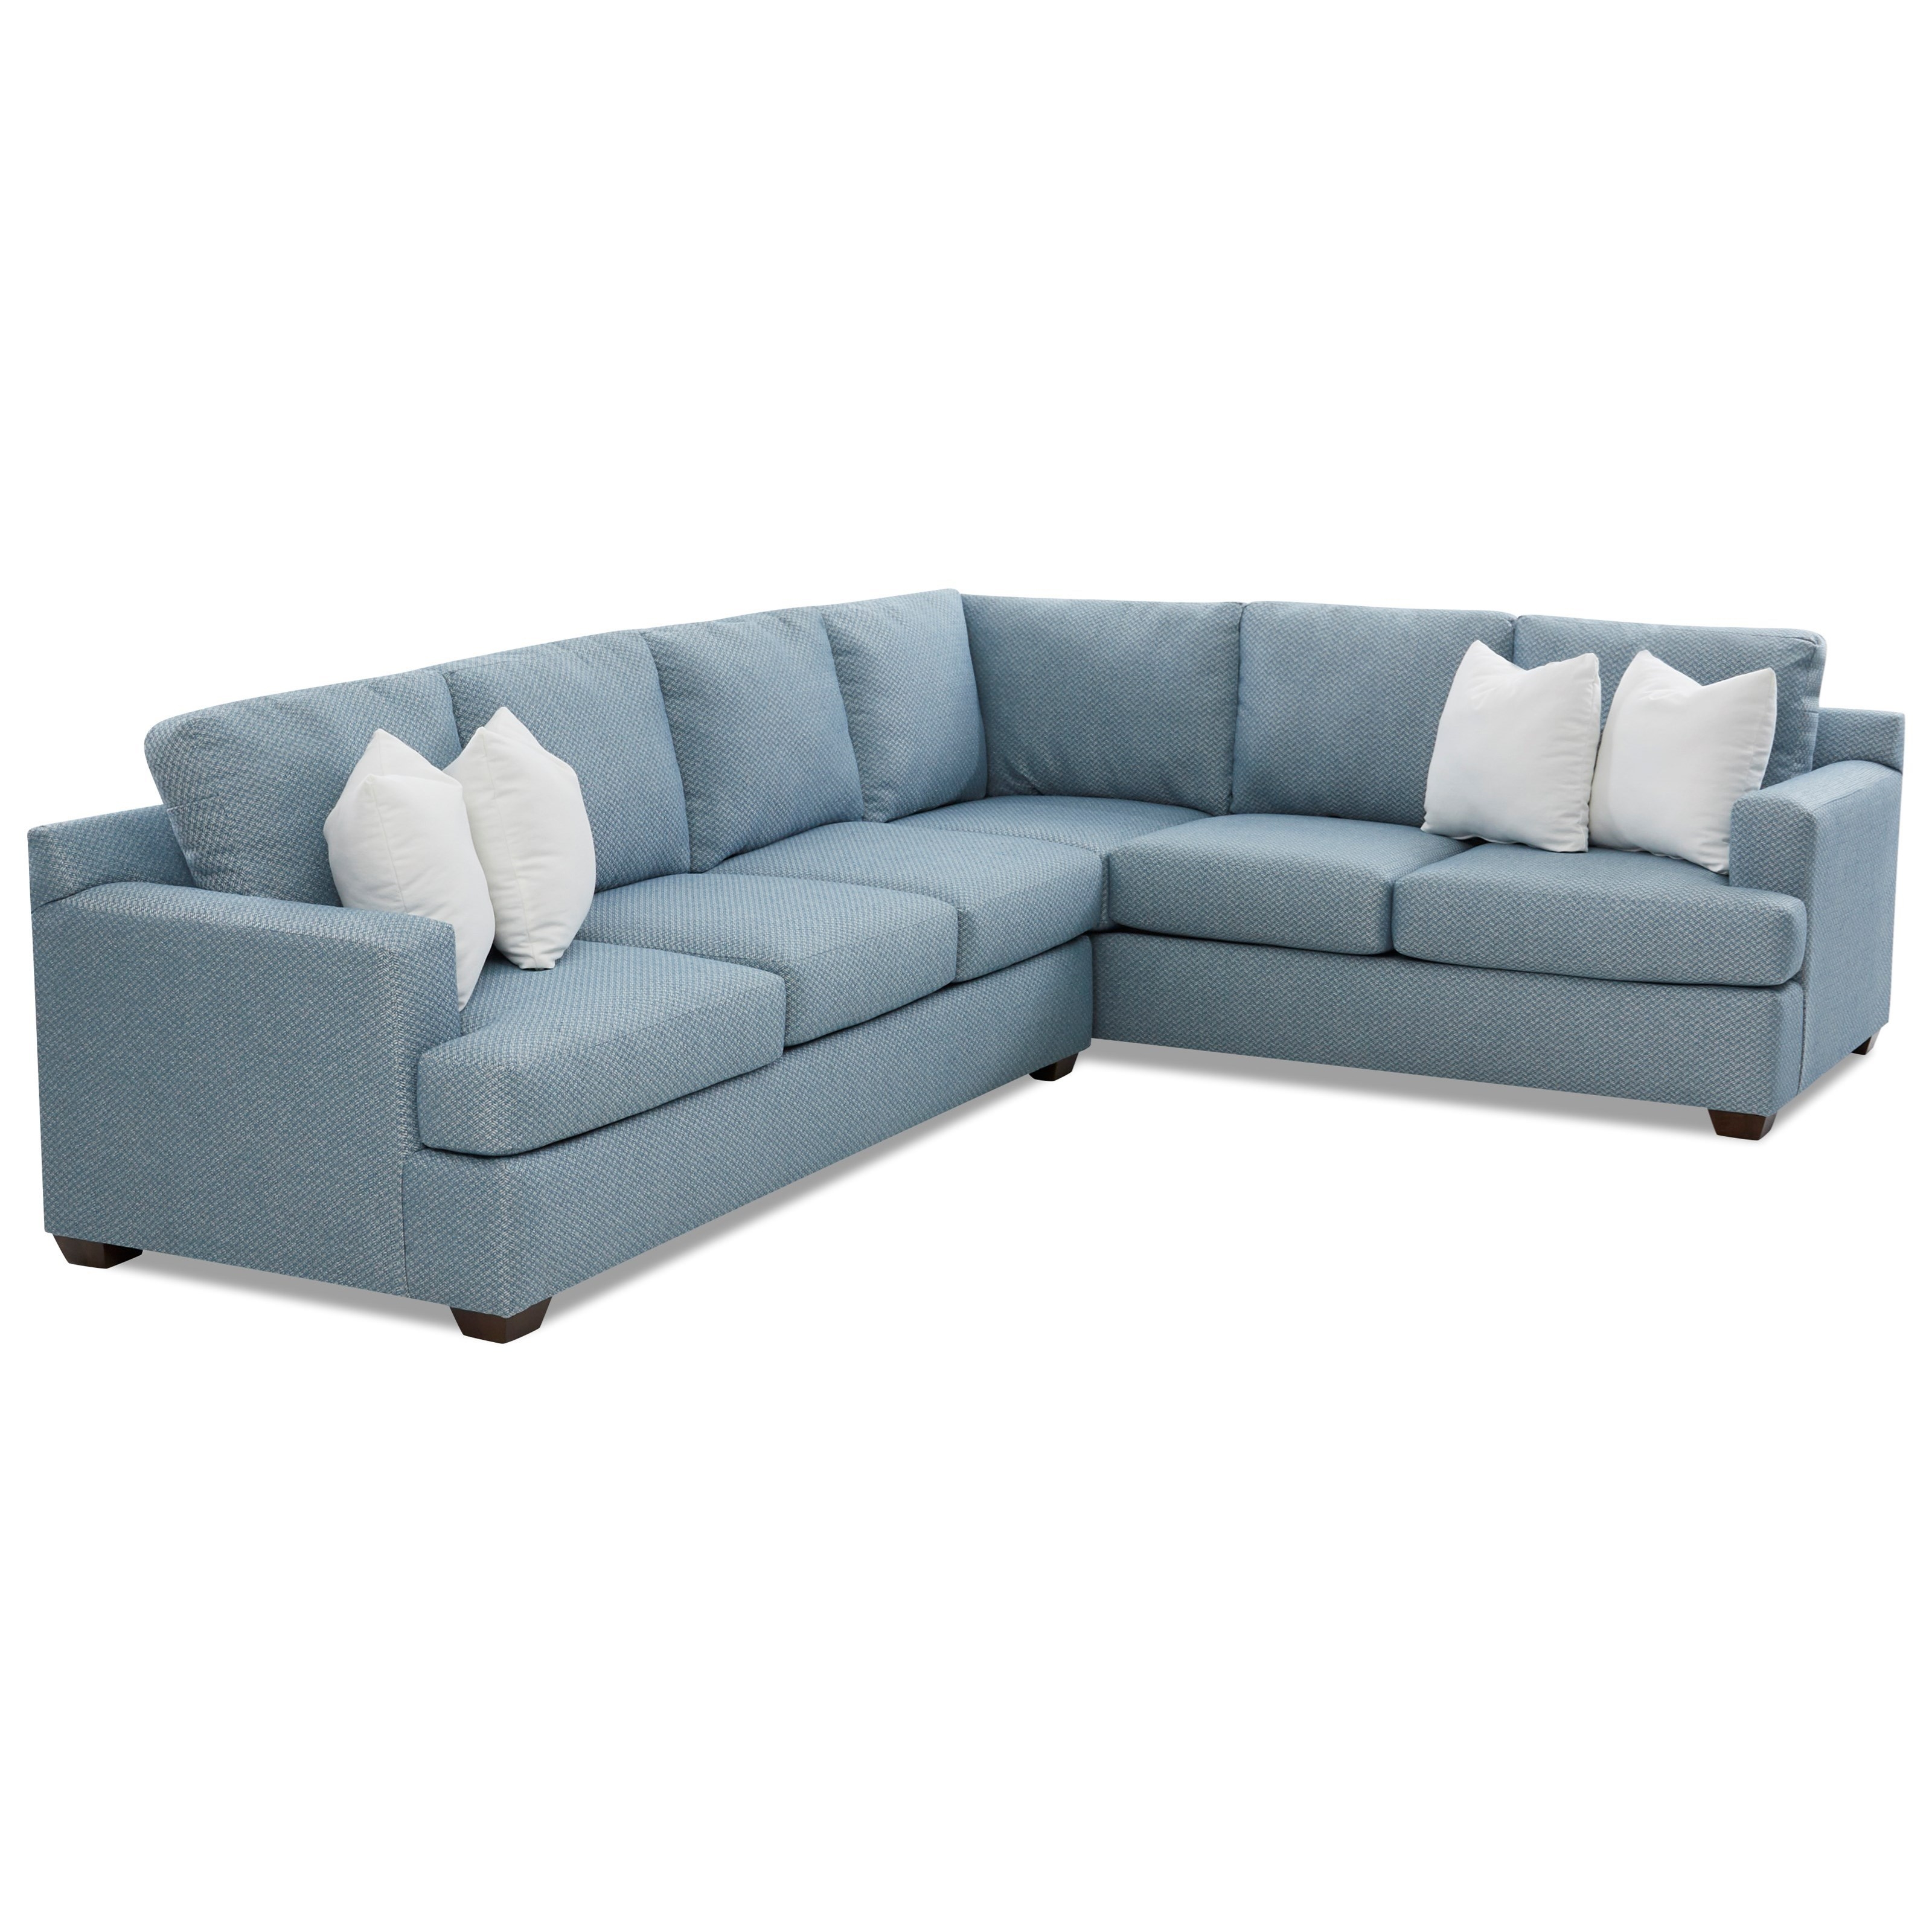 Juniper 5-Seat Sectional Sofa with RAF Corner